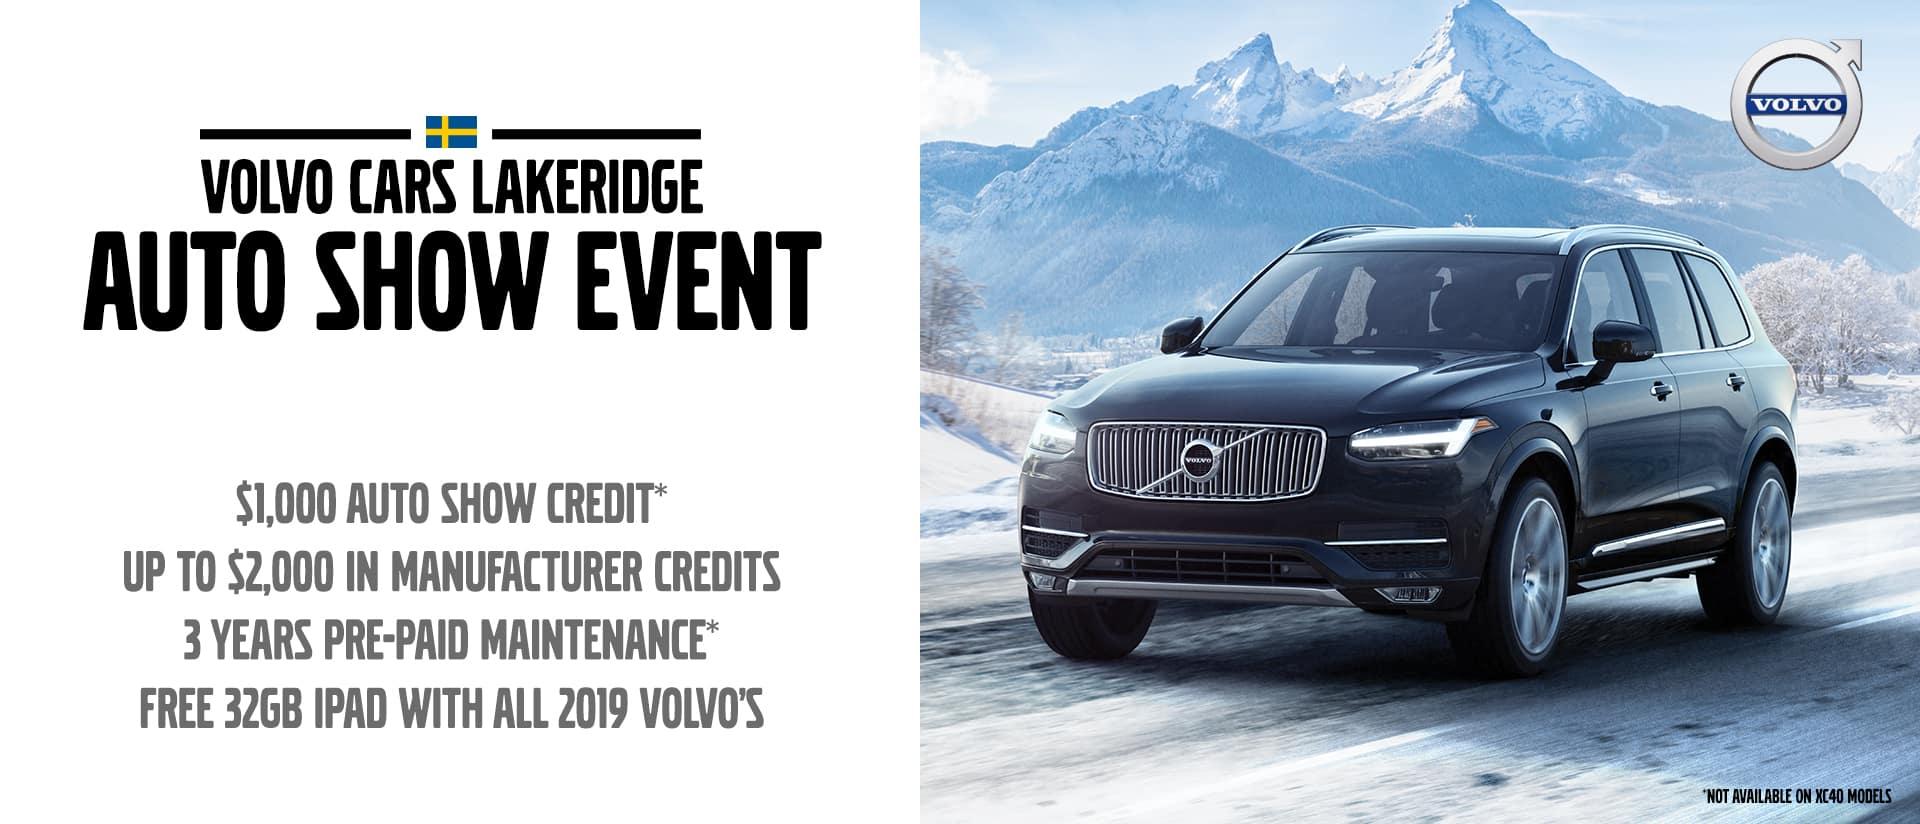 Volvo Cars Lakeridge